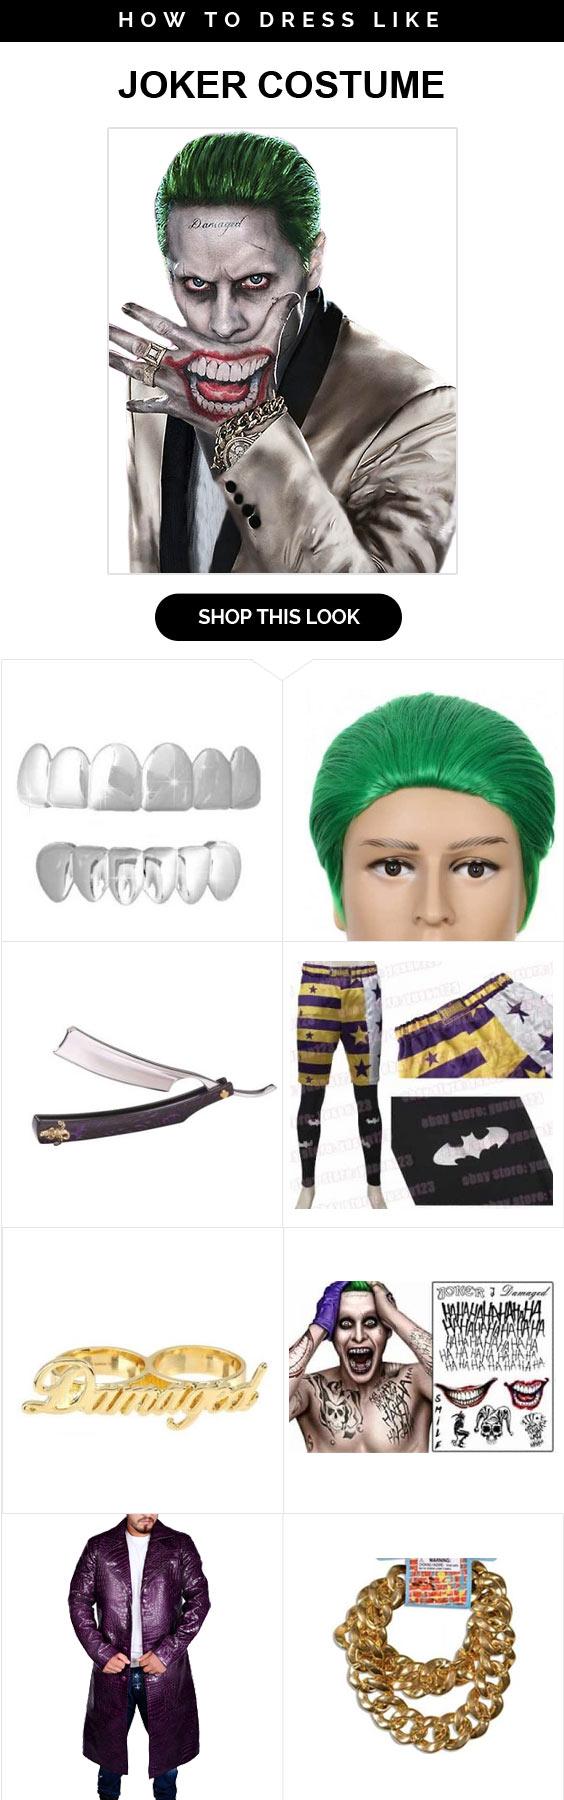 Suicide Squad Joker Costume Infographic